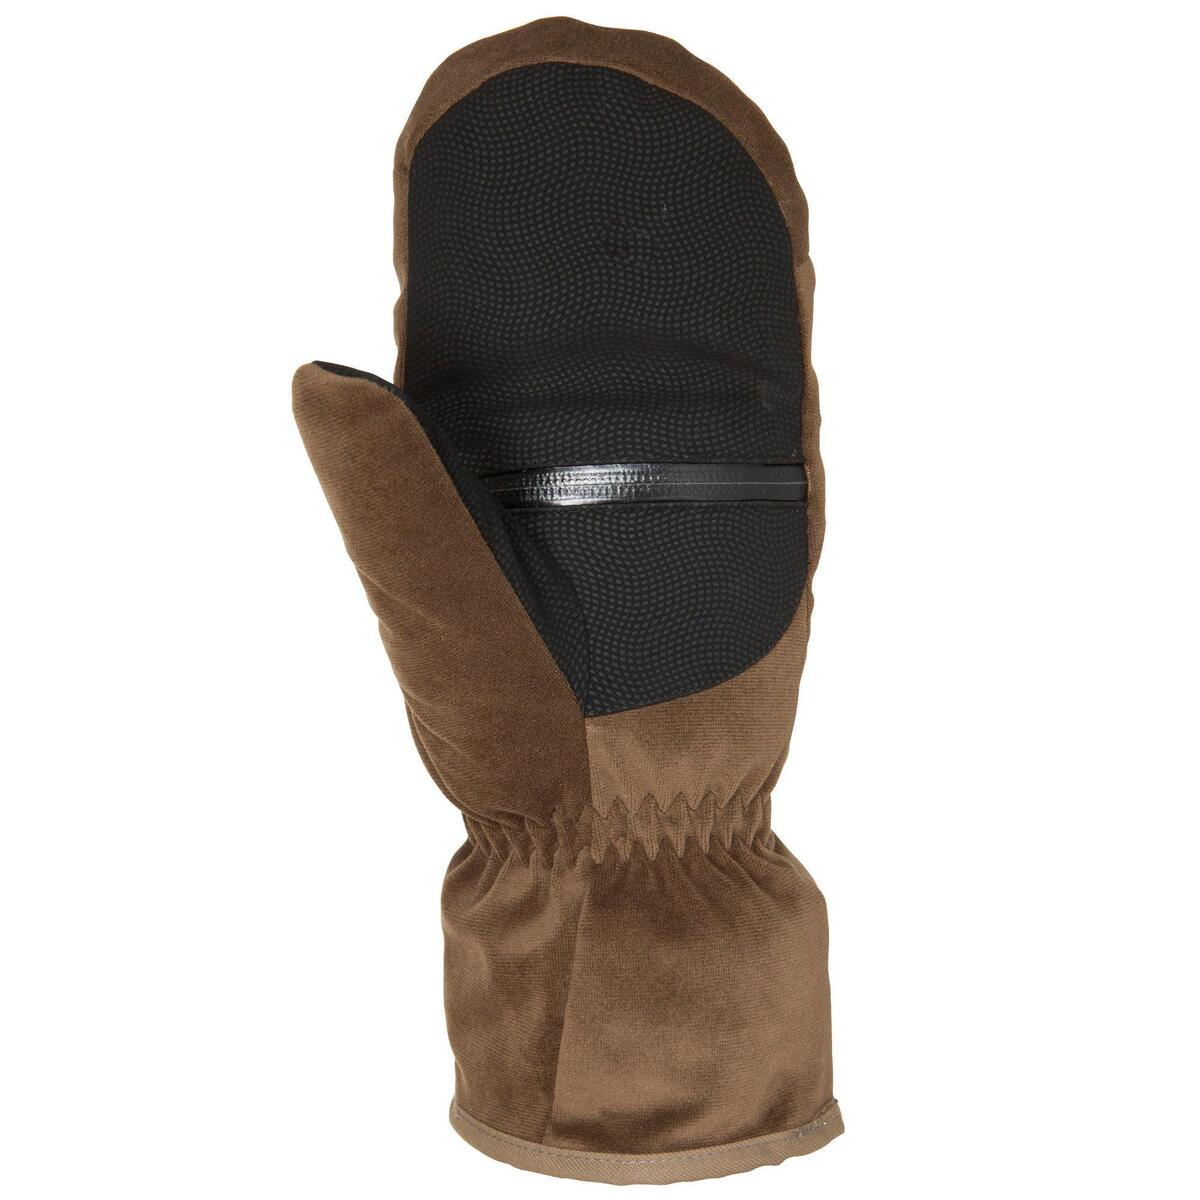 Bild 2 von Jagd-Handschuhe Toundra 500 braun